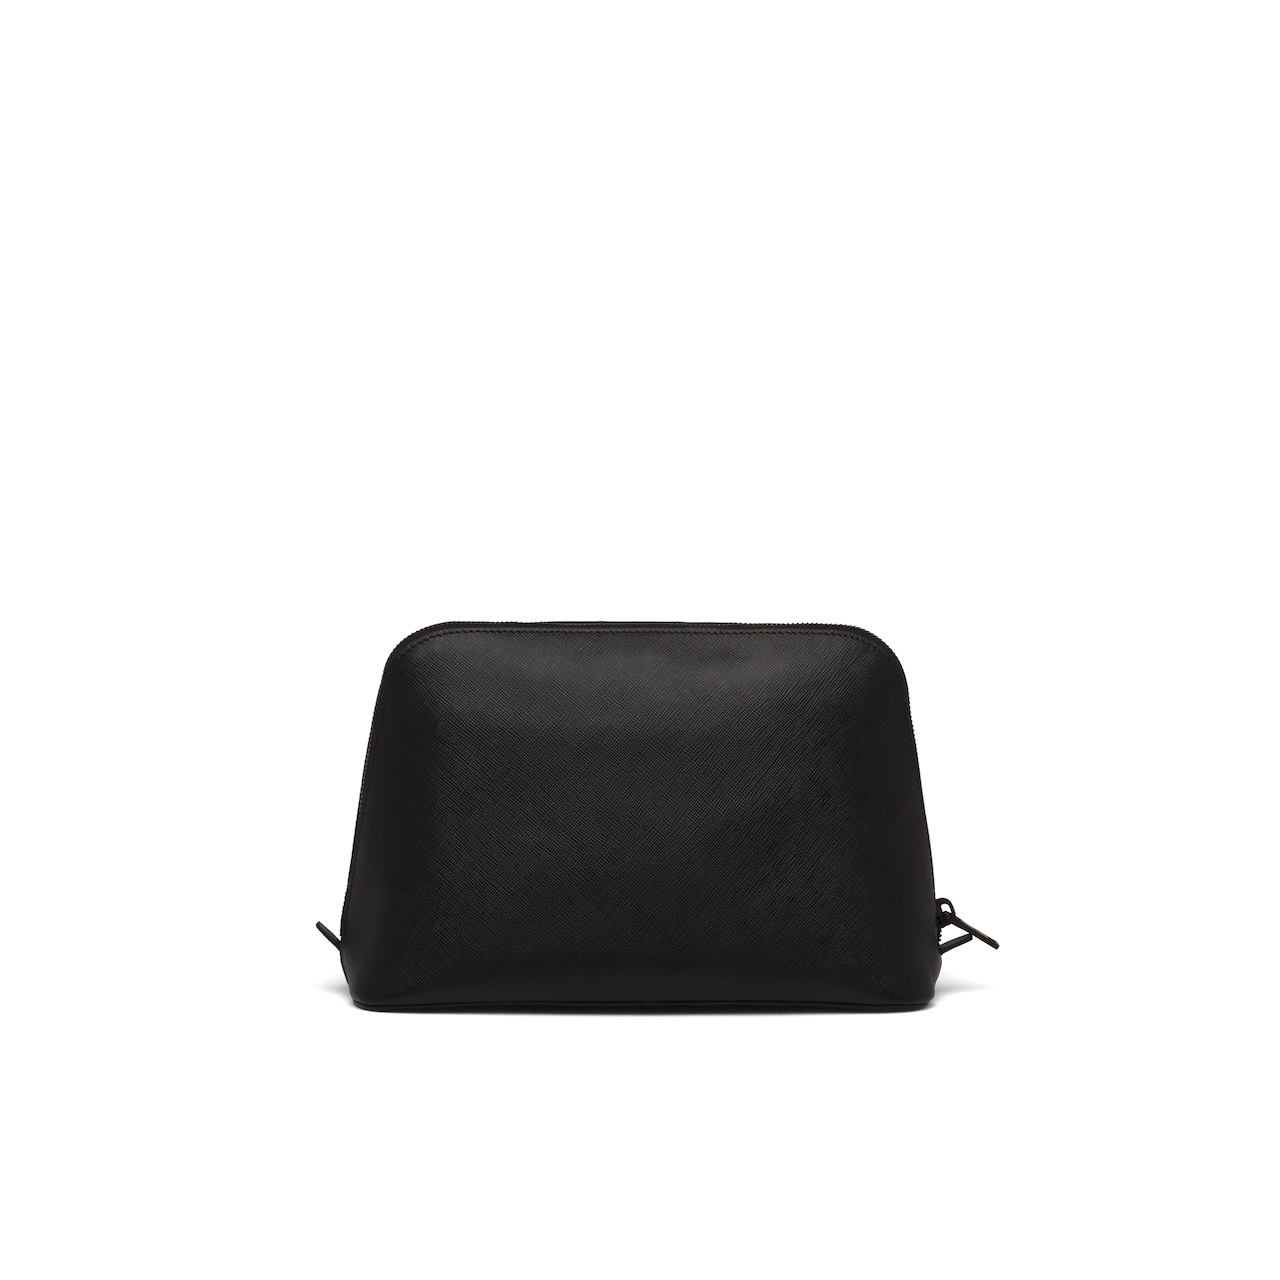 Prada Saffiano leather pouch 5